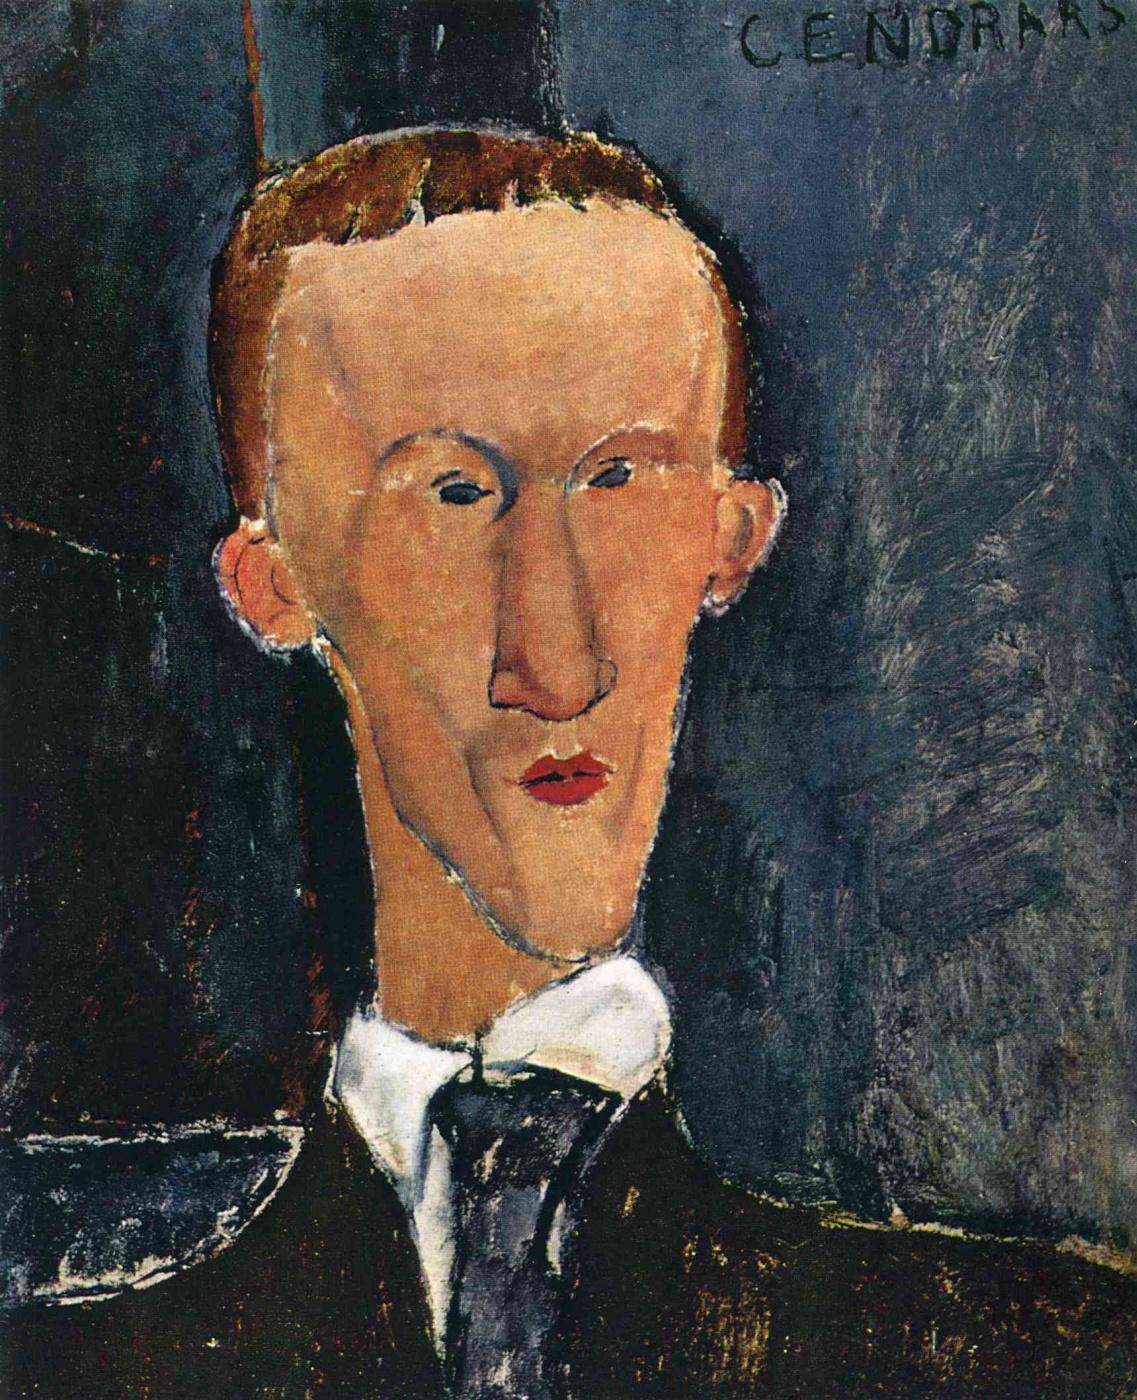 Amedeo Modigliani. Portrait Sankara Blaise